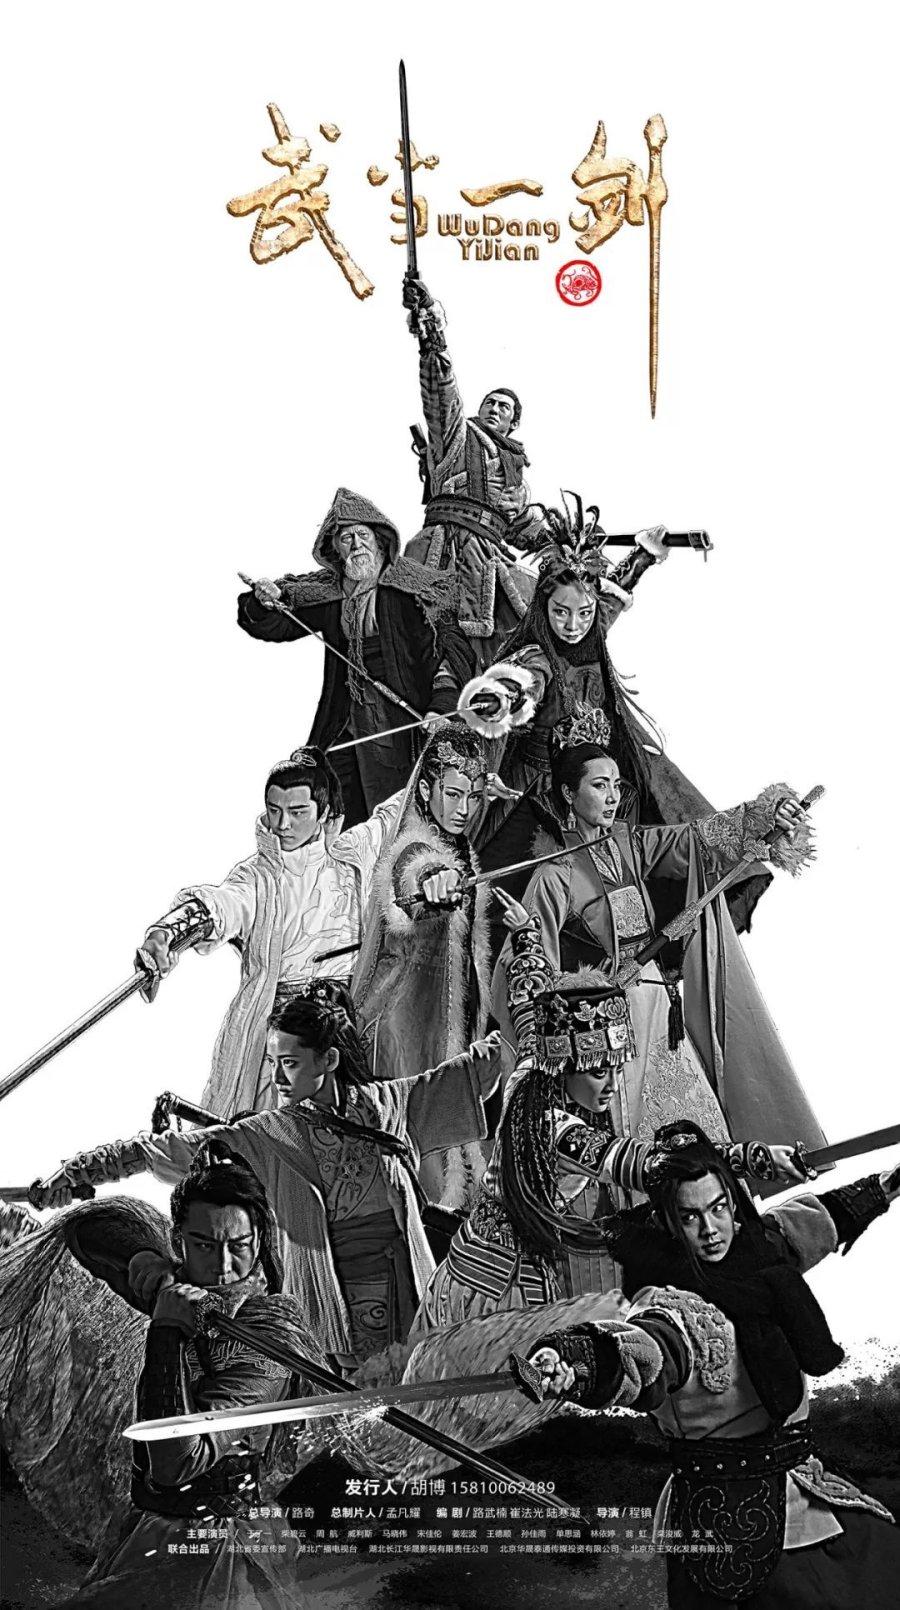 Wudang Sword (2021) / 武当一剑